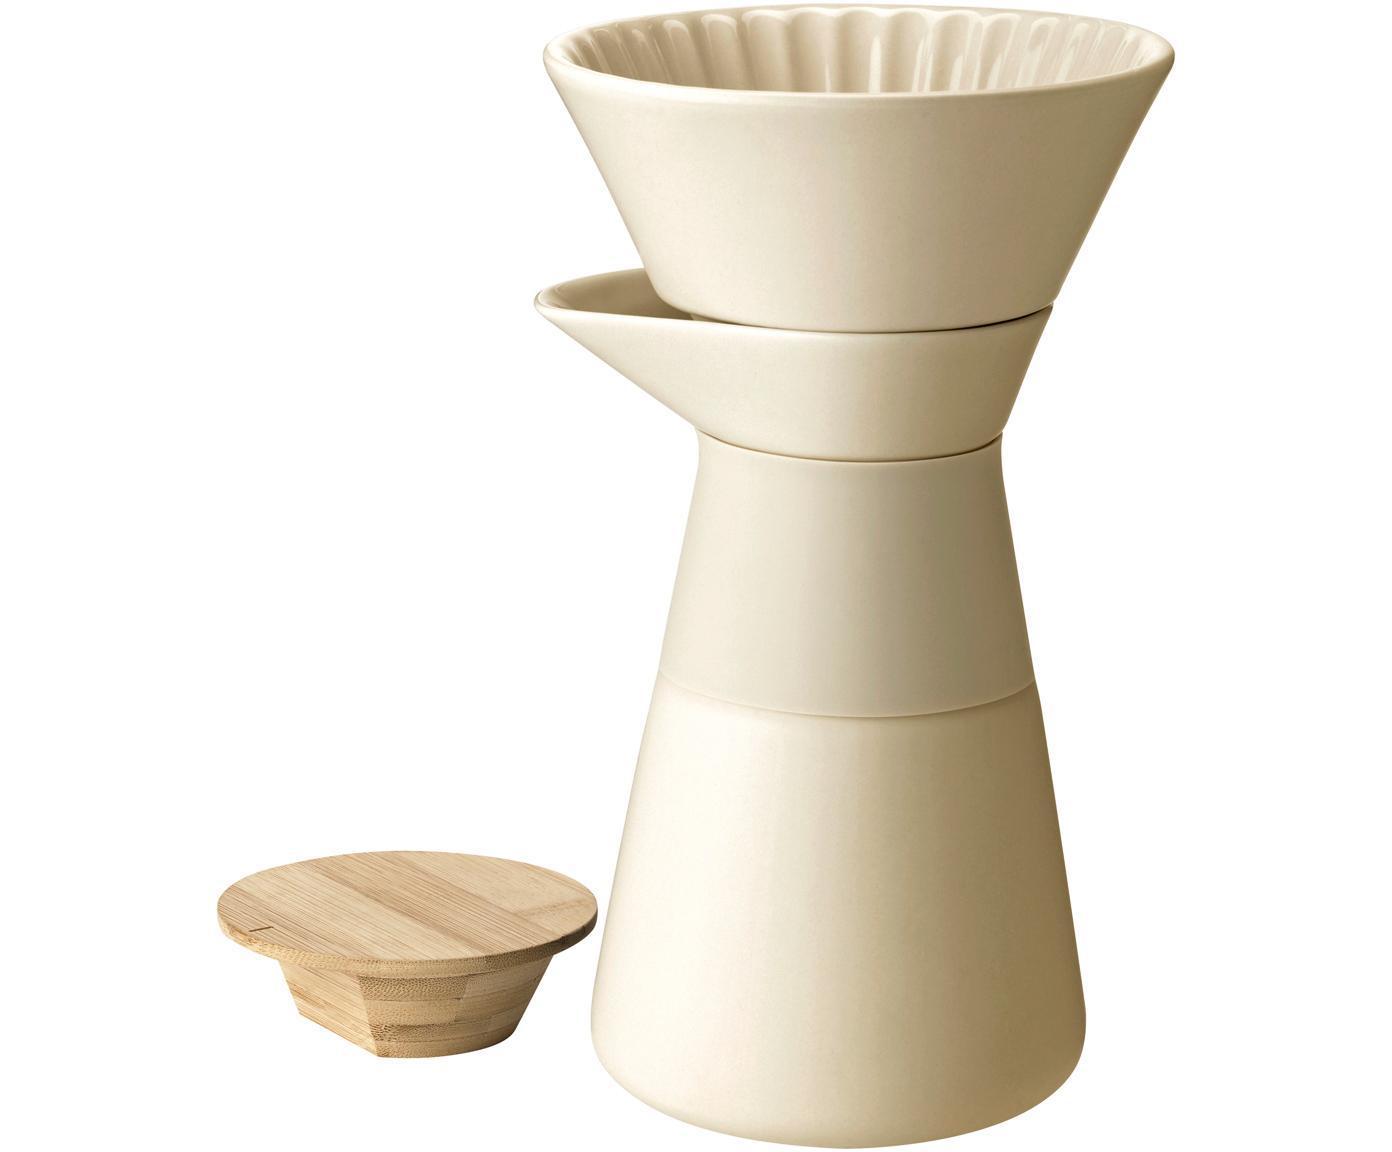 Cafetera Theo, Crema, 500 ml